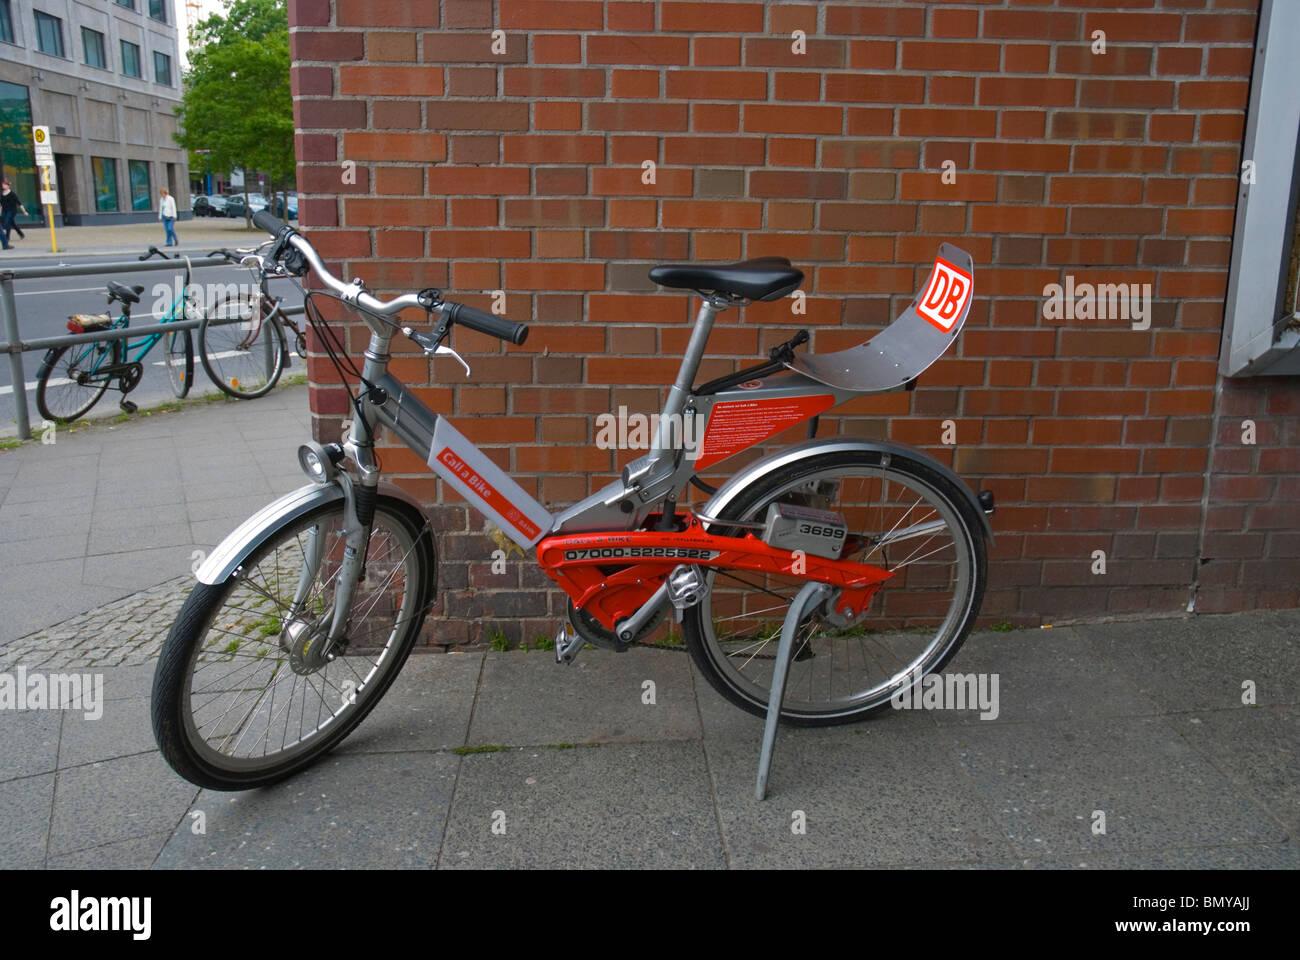 DB Deutsche Bahn rental bicycle outside Tiergarten S-Bahn station Berlin Germany Europe Stock Photo